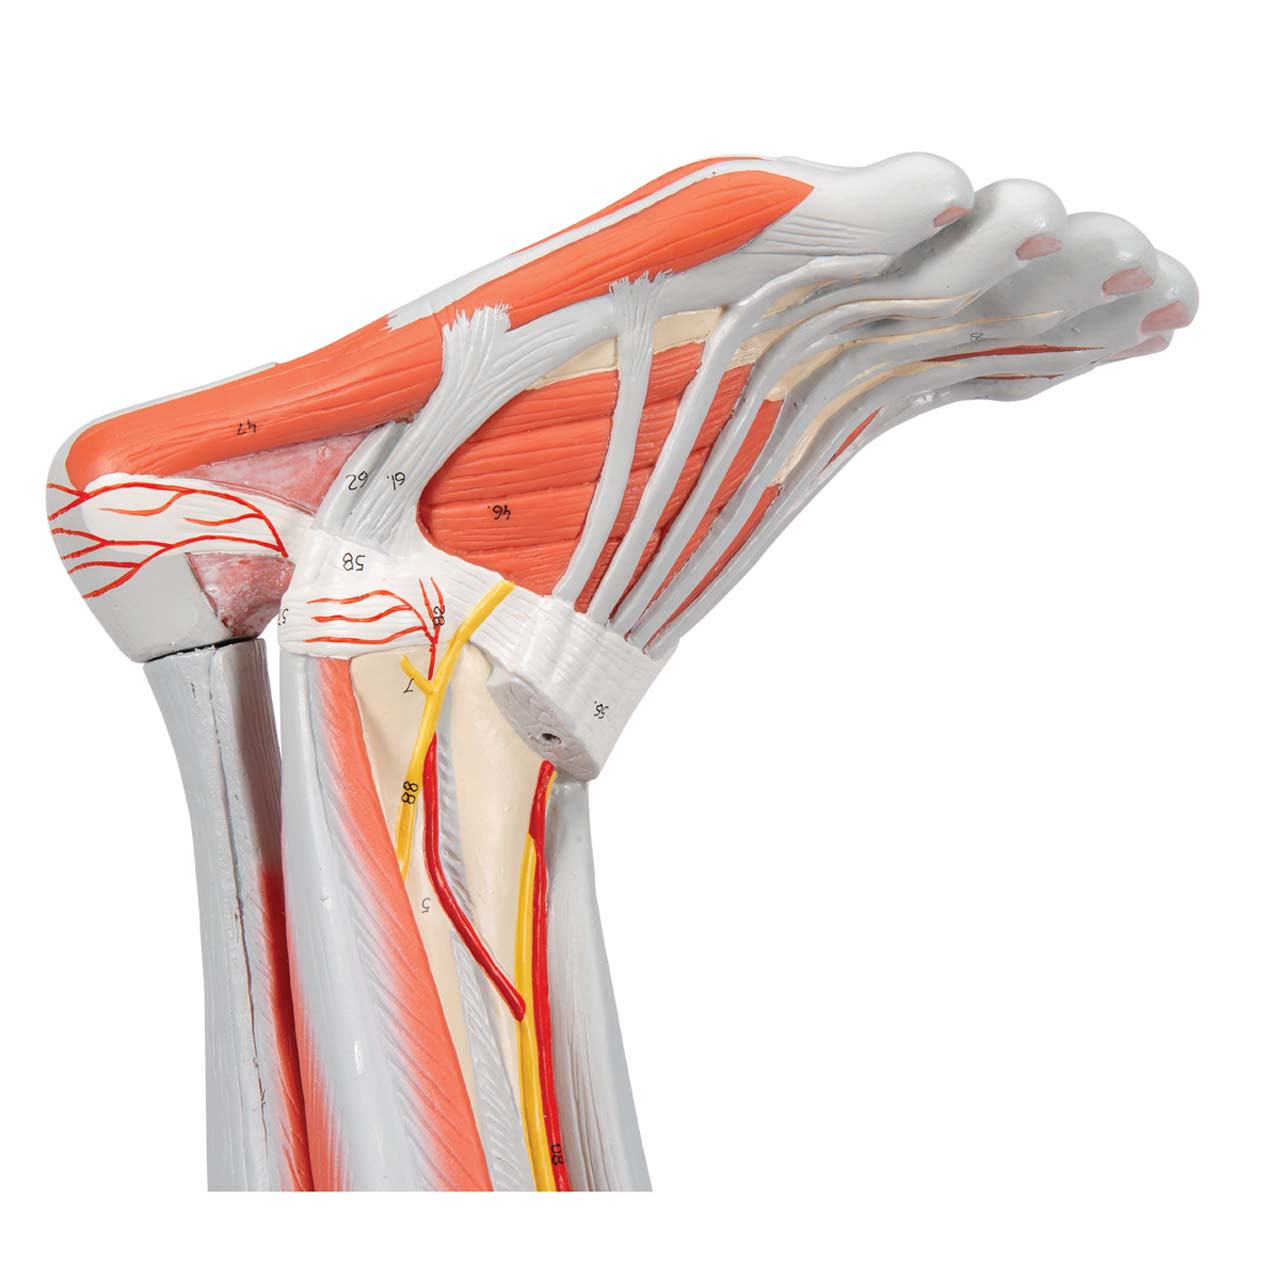 1000351 - Muscle Leg, 9 part, 3/4 Life Size